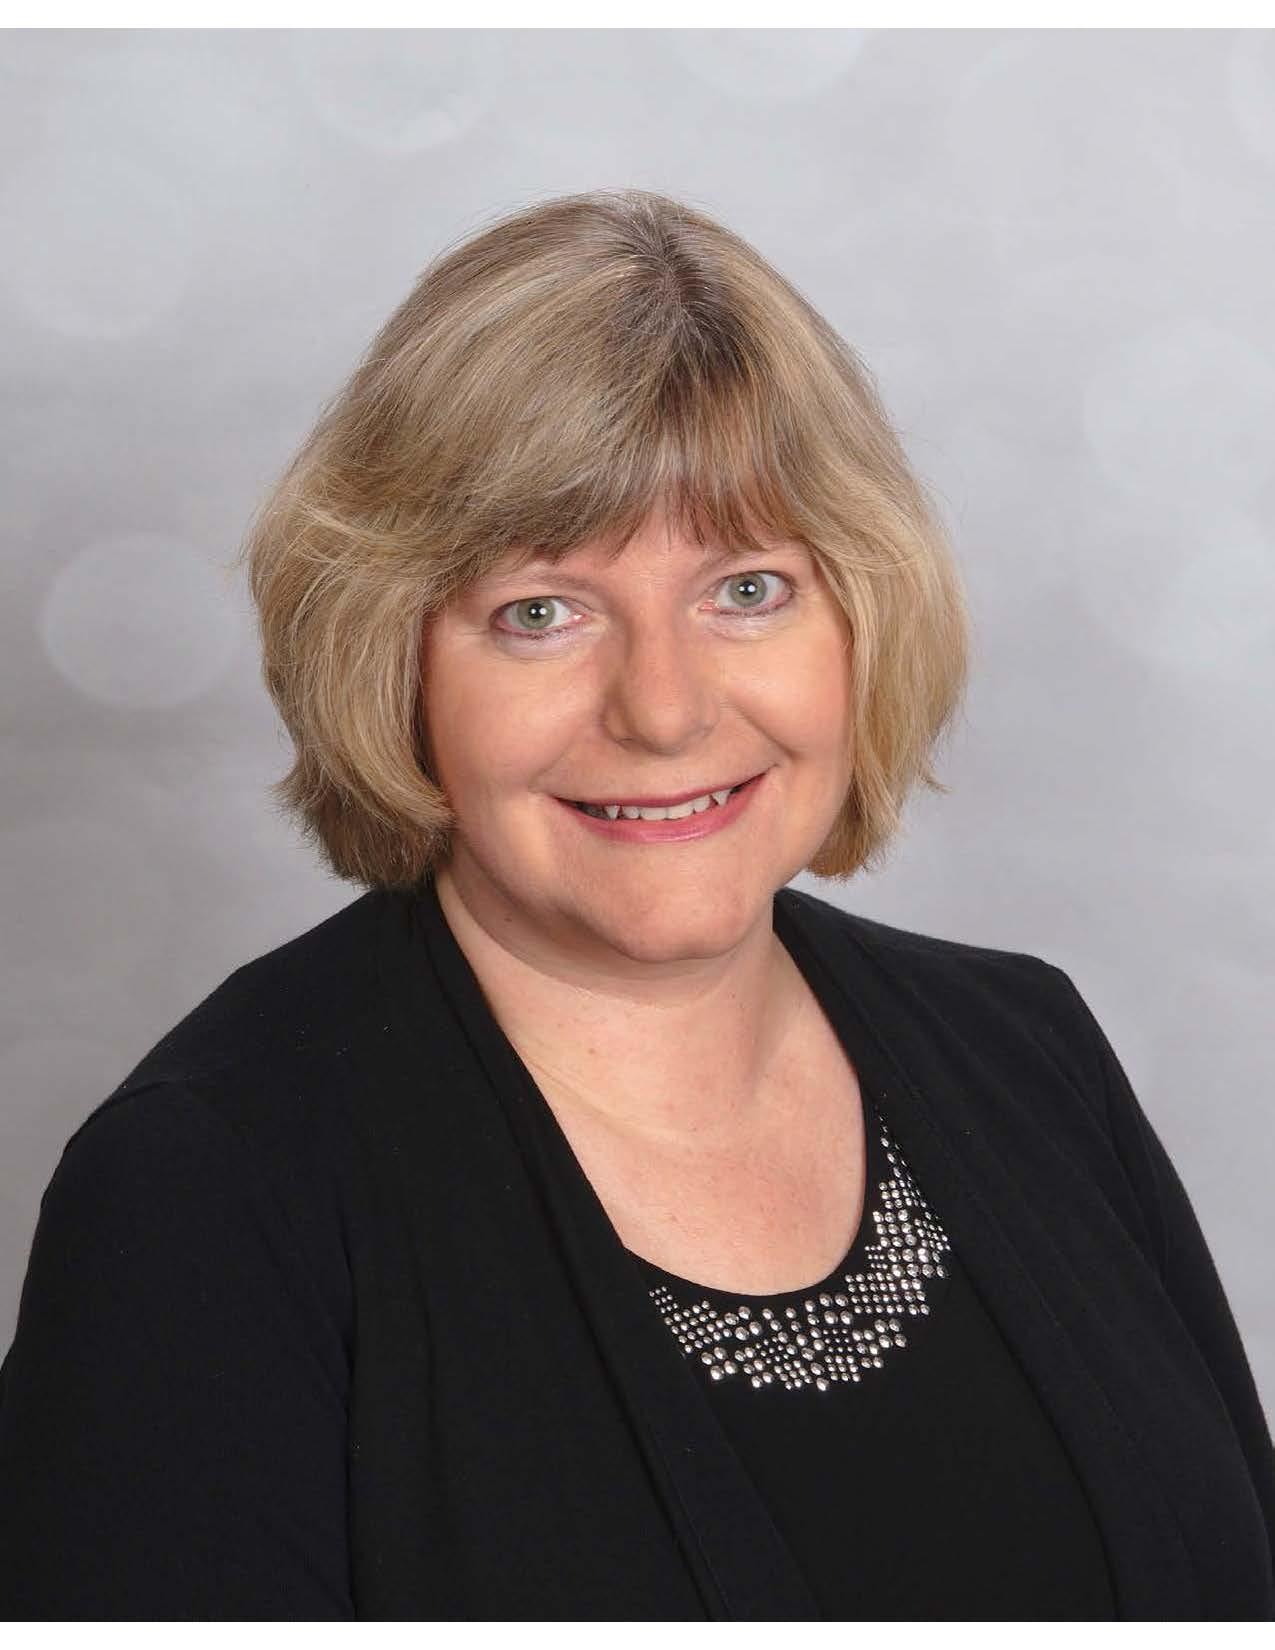 Pamela Crowell